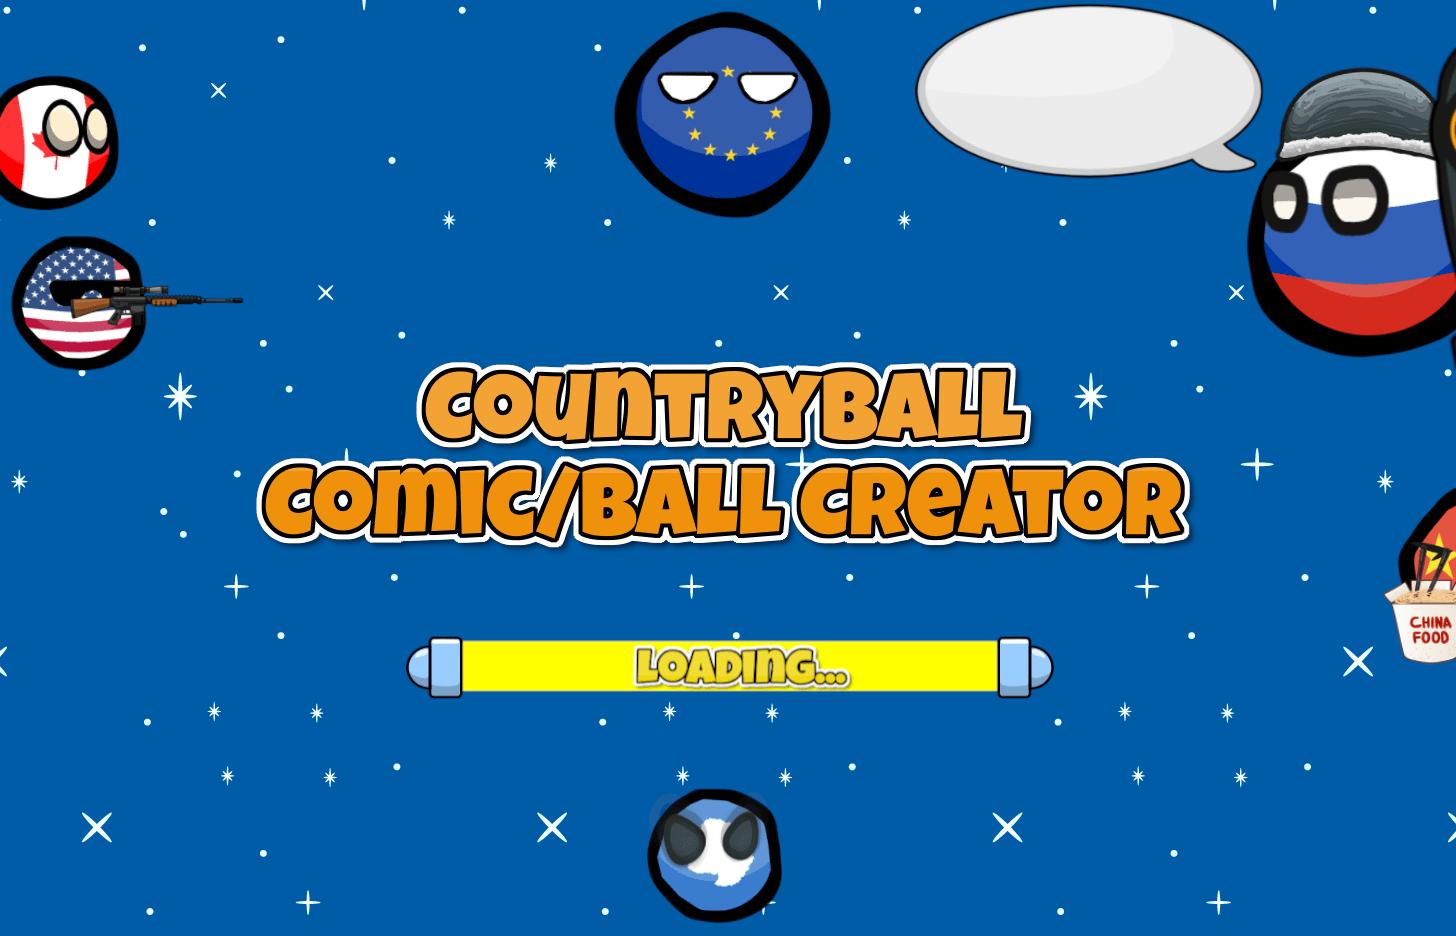 Draw A Countryball Polandball Comic For You By Vladosterreiche